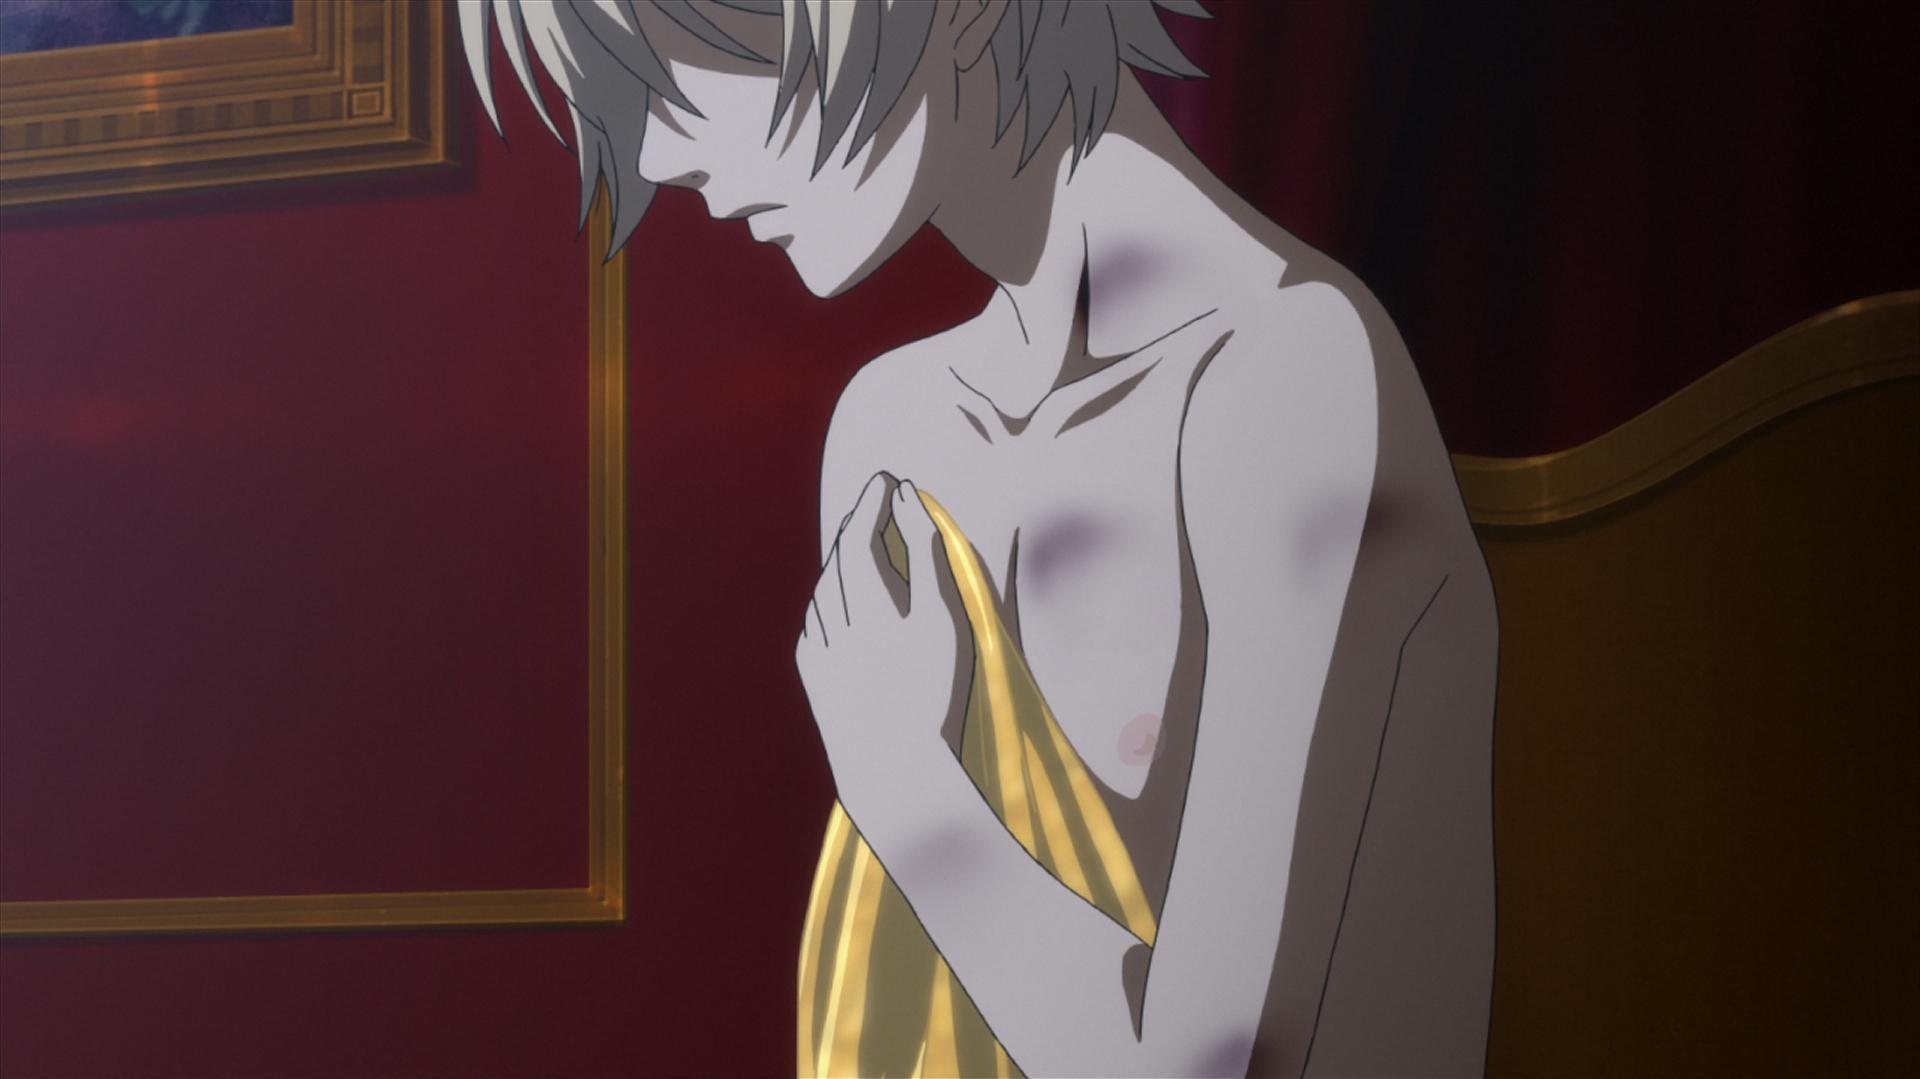 Video black butler season 2 clip 1 kuroshitsuji wiki your